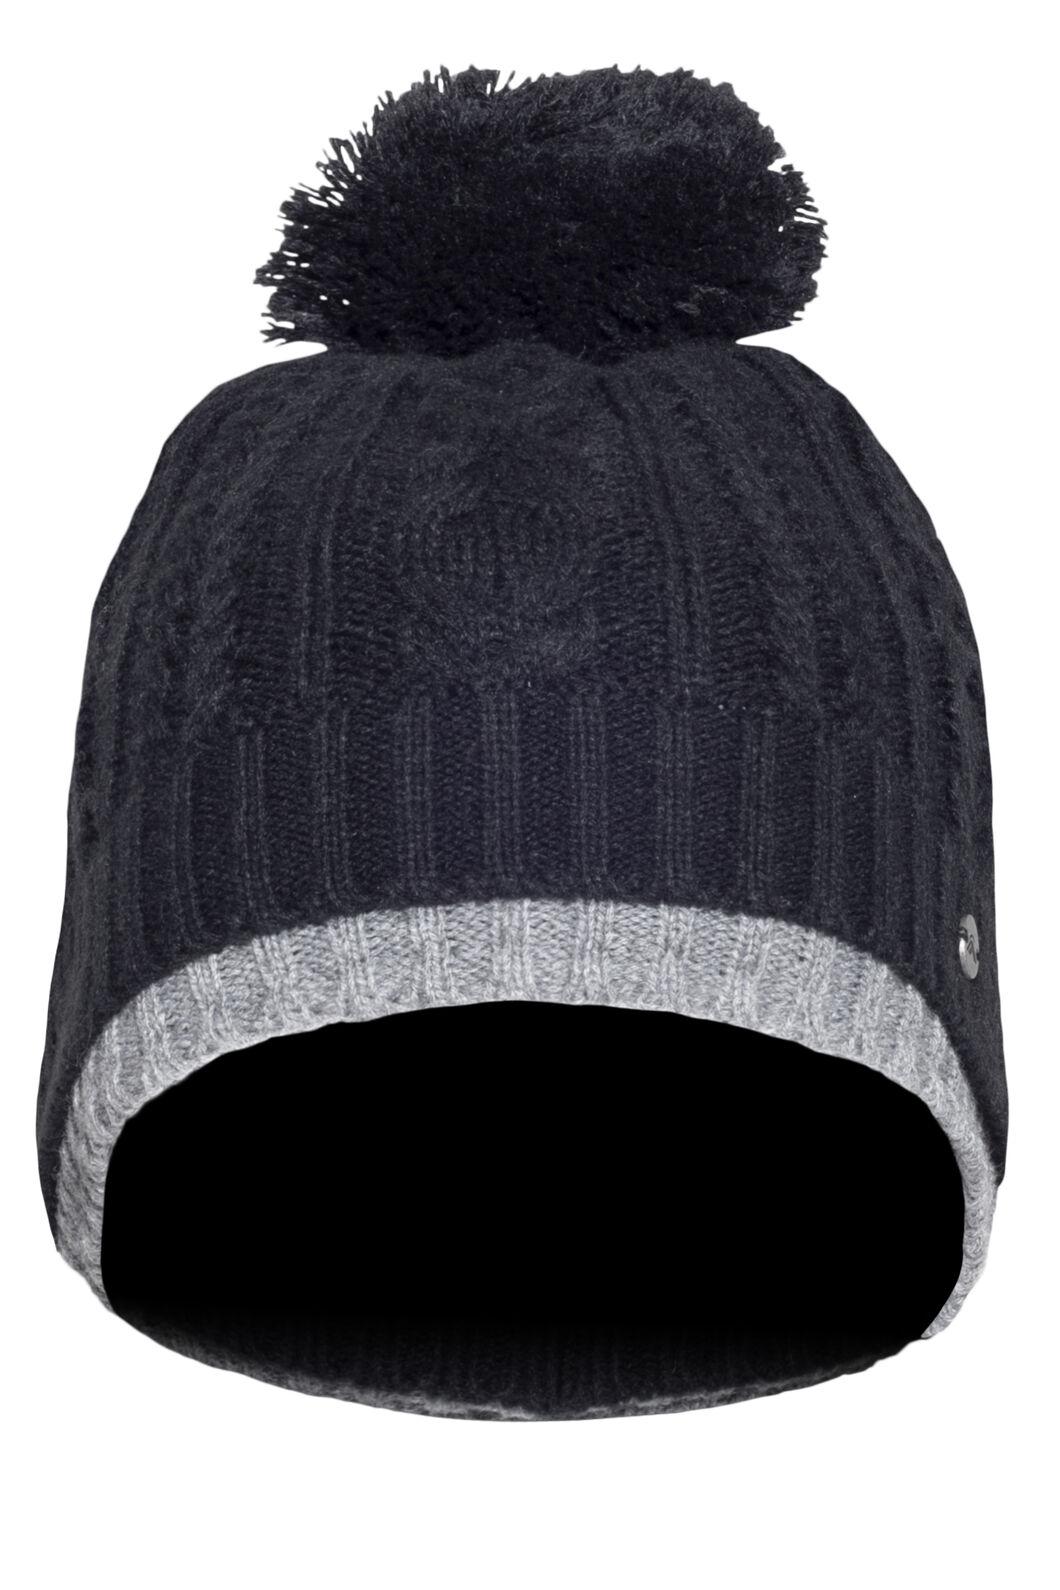 Macpac Rhythm Fleece Lined Beanie, Black/Light Grey Marle, hi-res